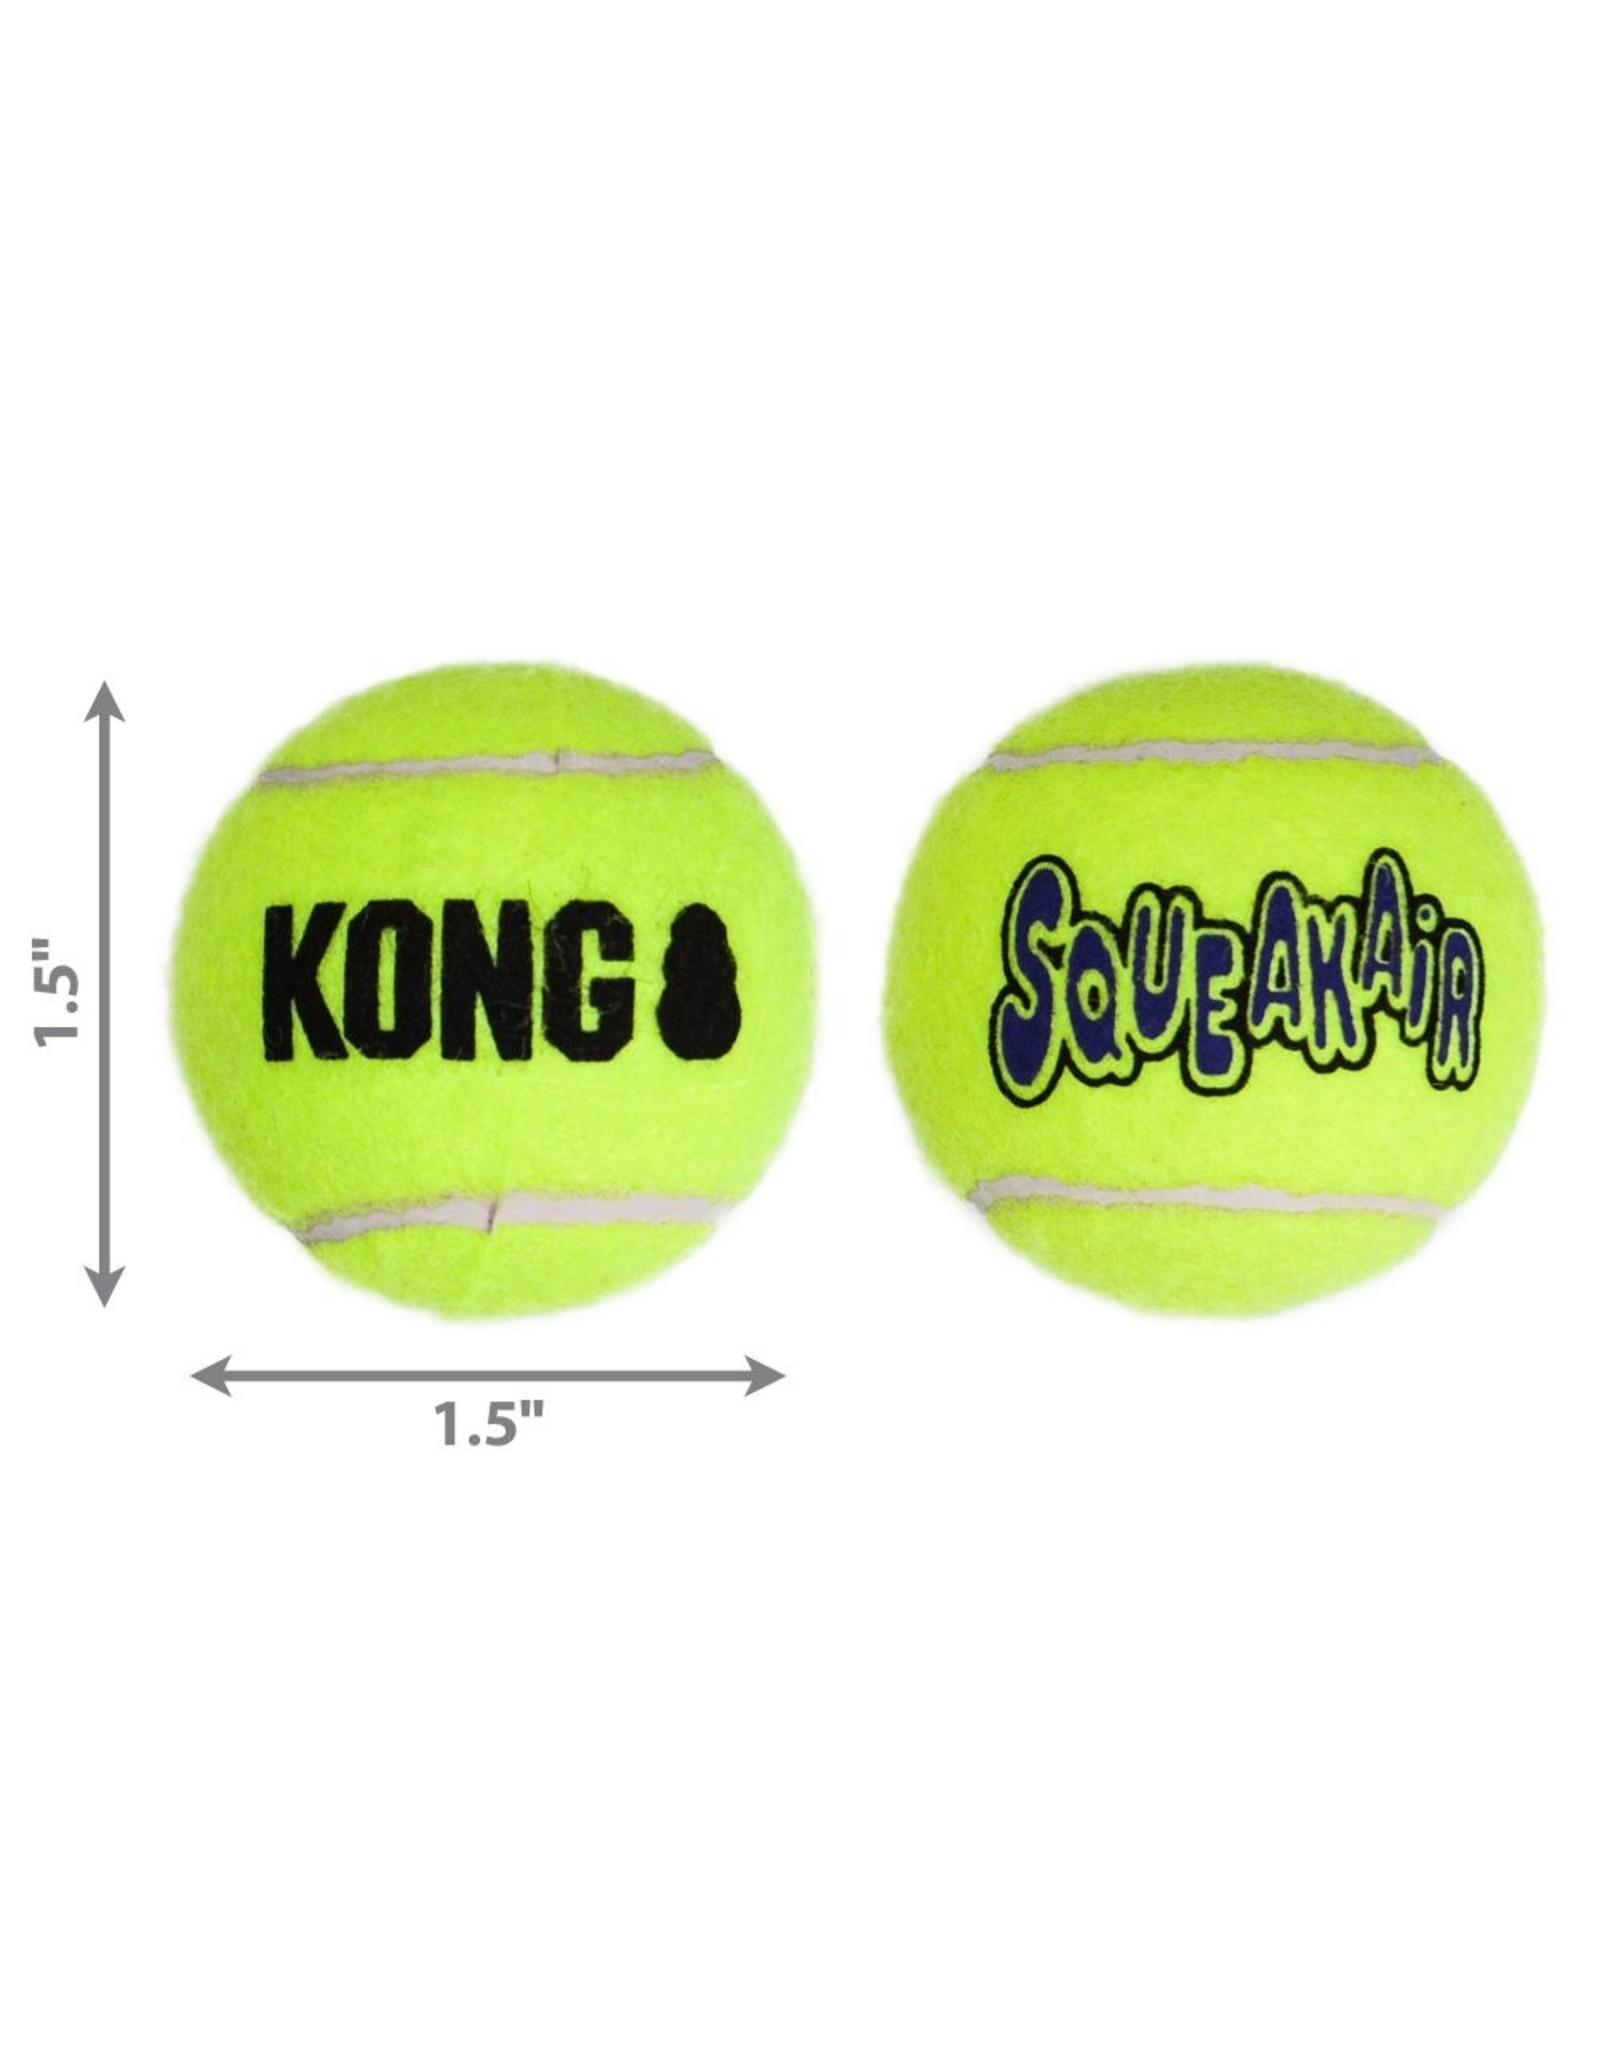 Kong Kong SqueakAir Ball X-Small 3 pk